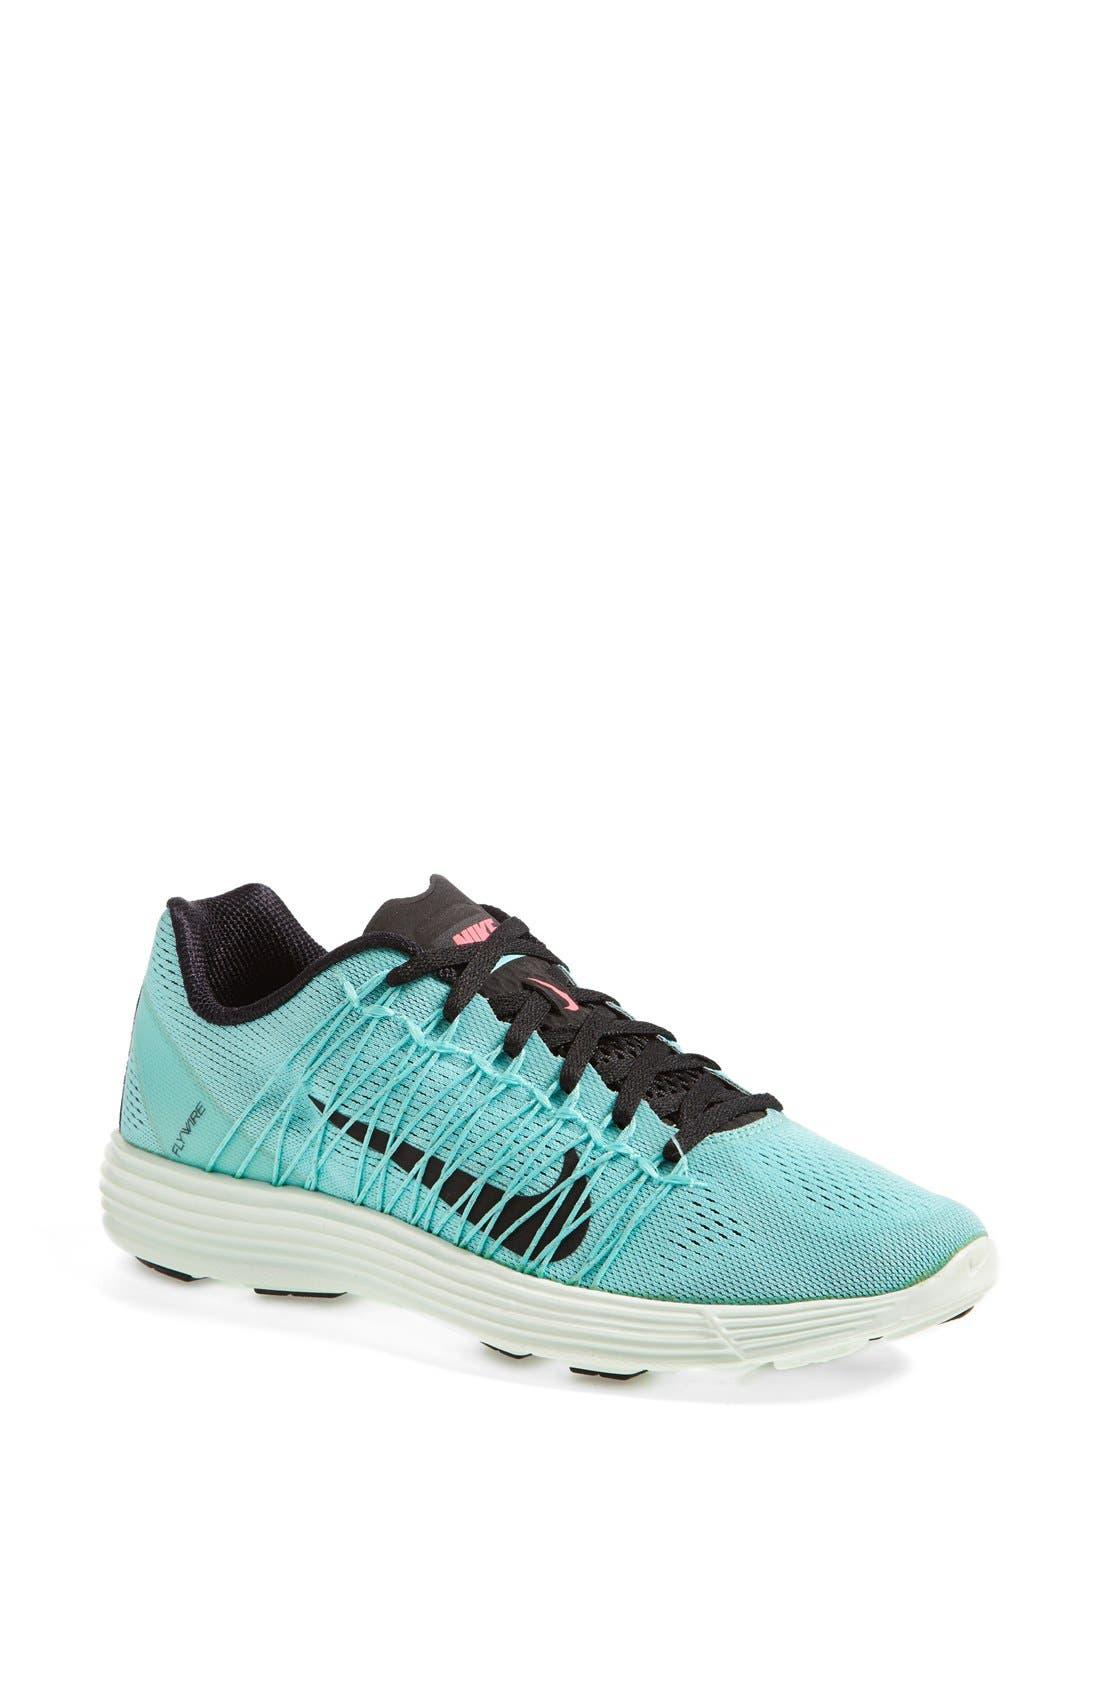 'Lunaracer+ 3' Running Shoe,                             Main thumbnail 1, color,                             Hyper Turquoise